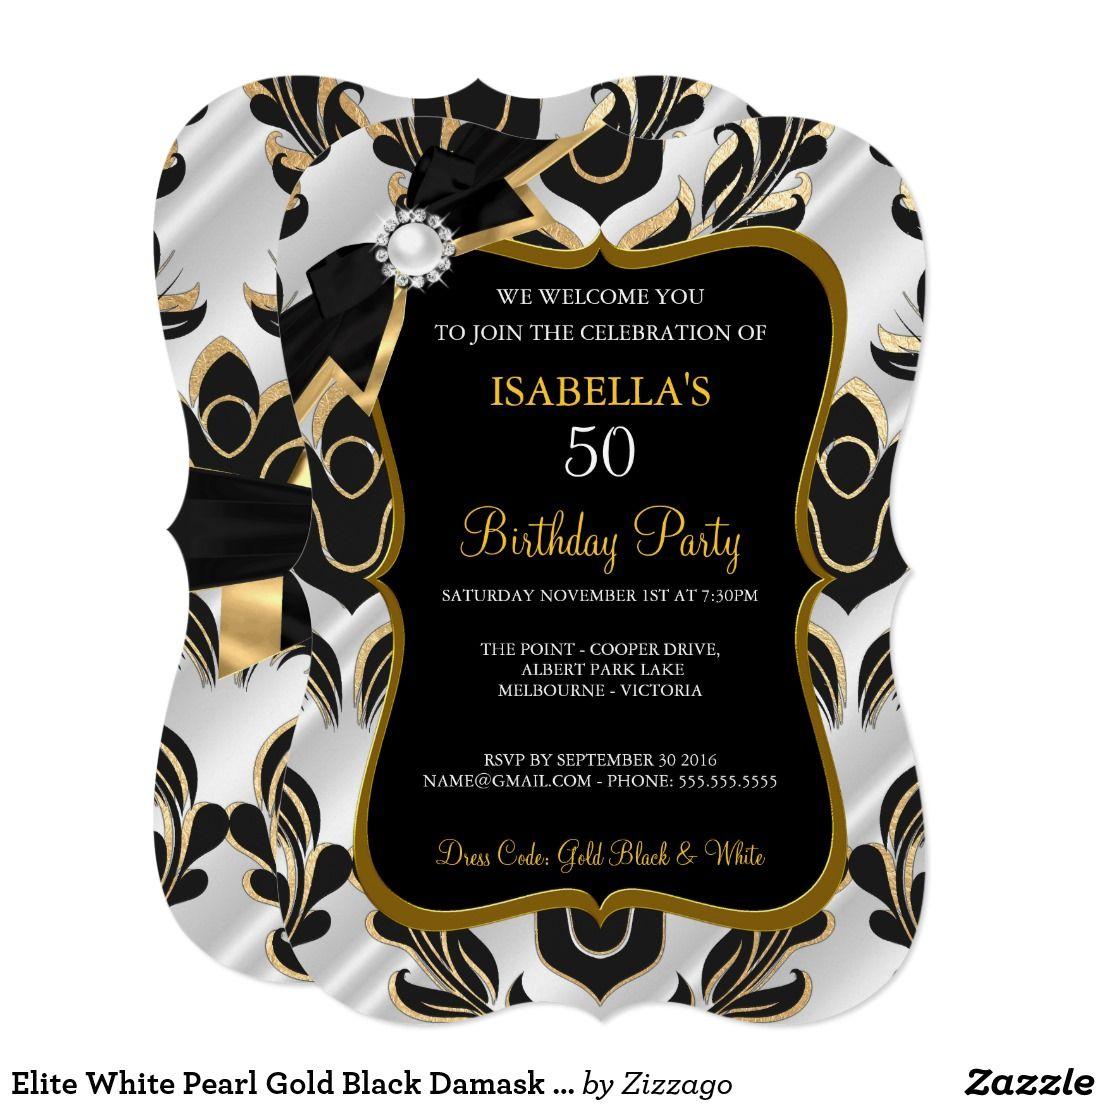 Elite White Pearl Gold Black Damask Party Invite White Pearl Gold ...